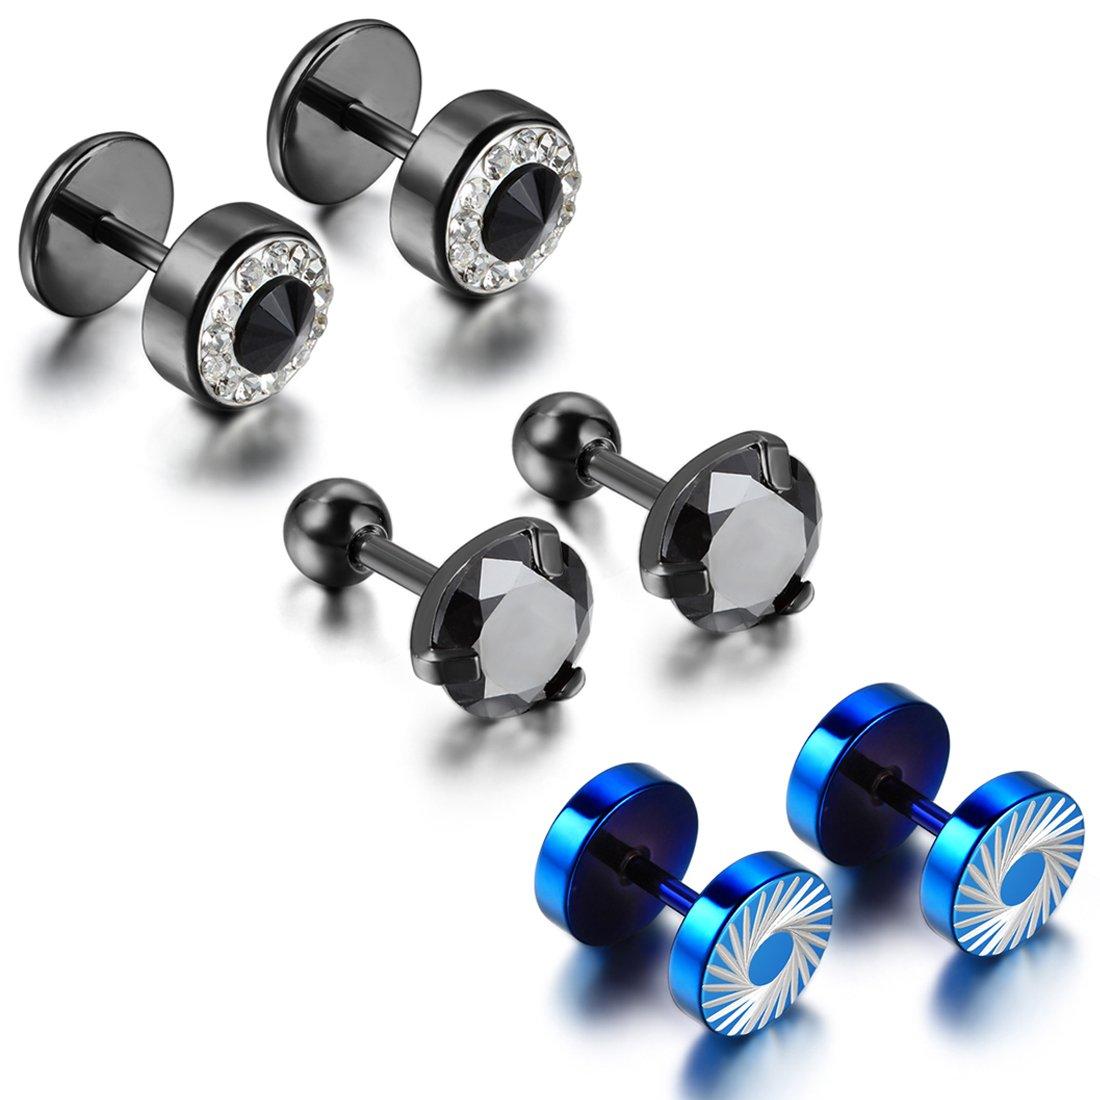 0154d718cc692 Cupimatch 6PCS Men's Stainless Steel Rhinestone Faux Illusion Stud Earrings  Ear Plugs Tunnel Set